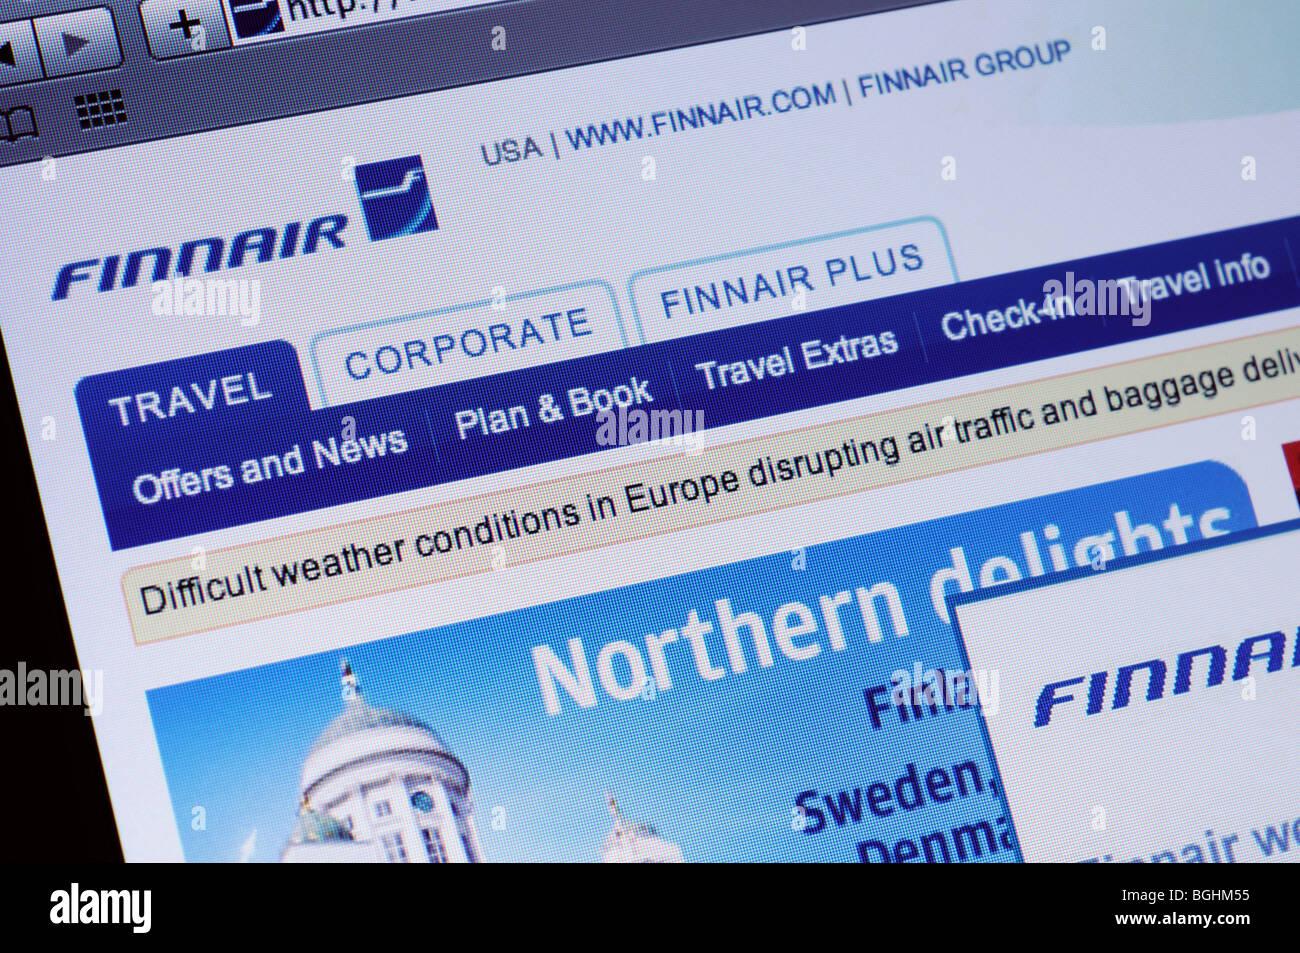 Finnair Stock